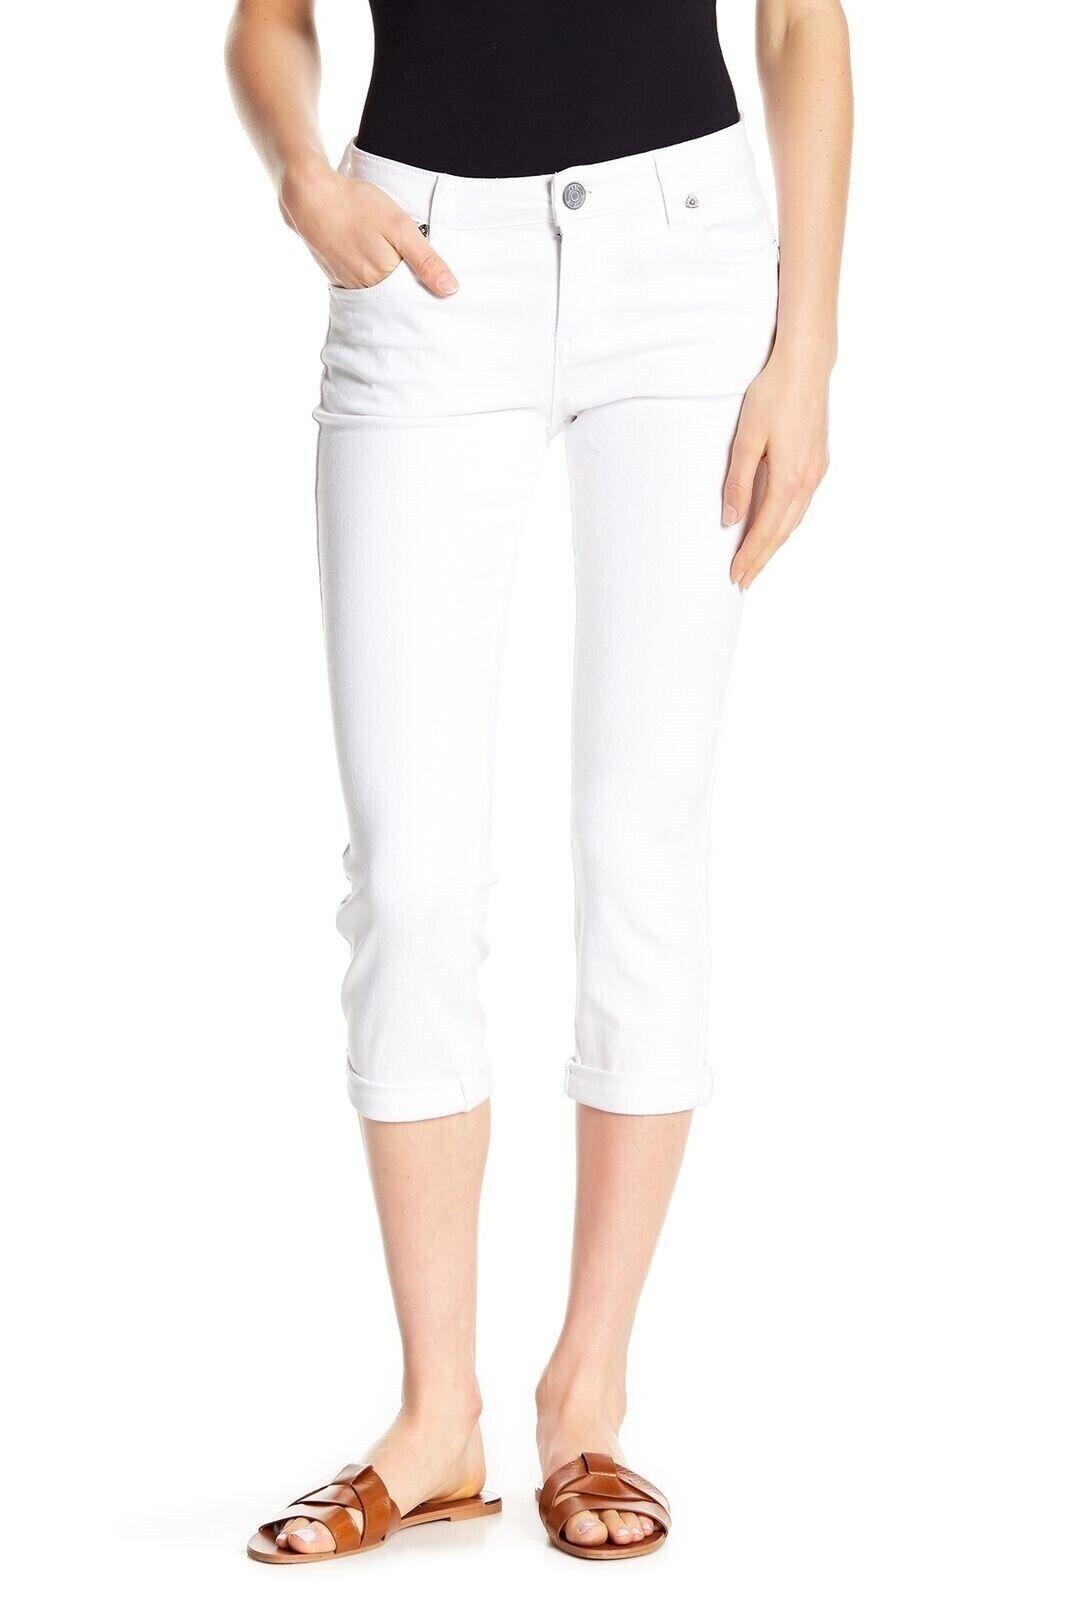 Kut från Klot 155029 Bardot Skinny Pojkvän vit Jeans Plus Storlek 18W